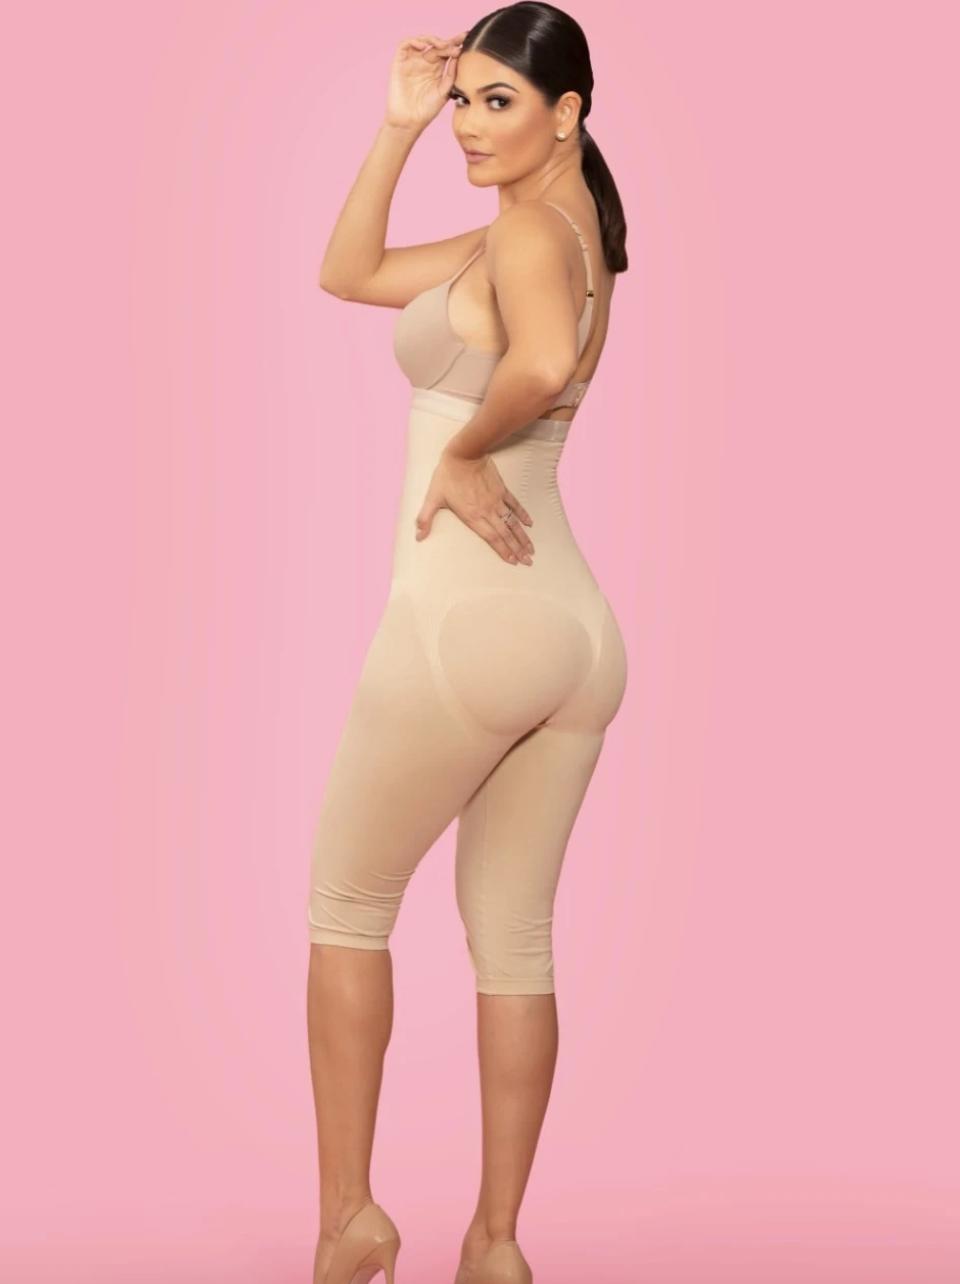 Ana Patricia, coleccion de fajas, fajas, modelando fajas